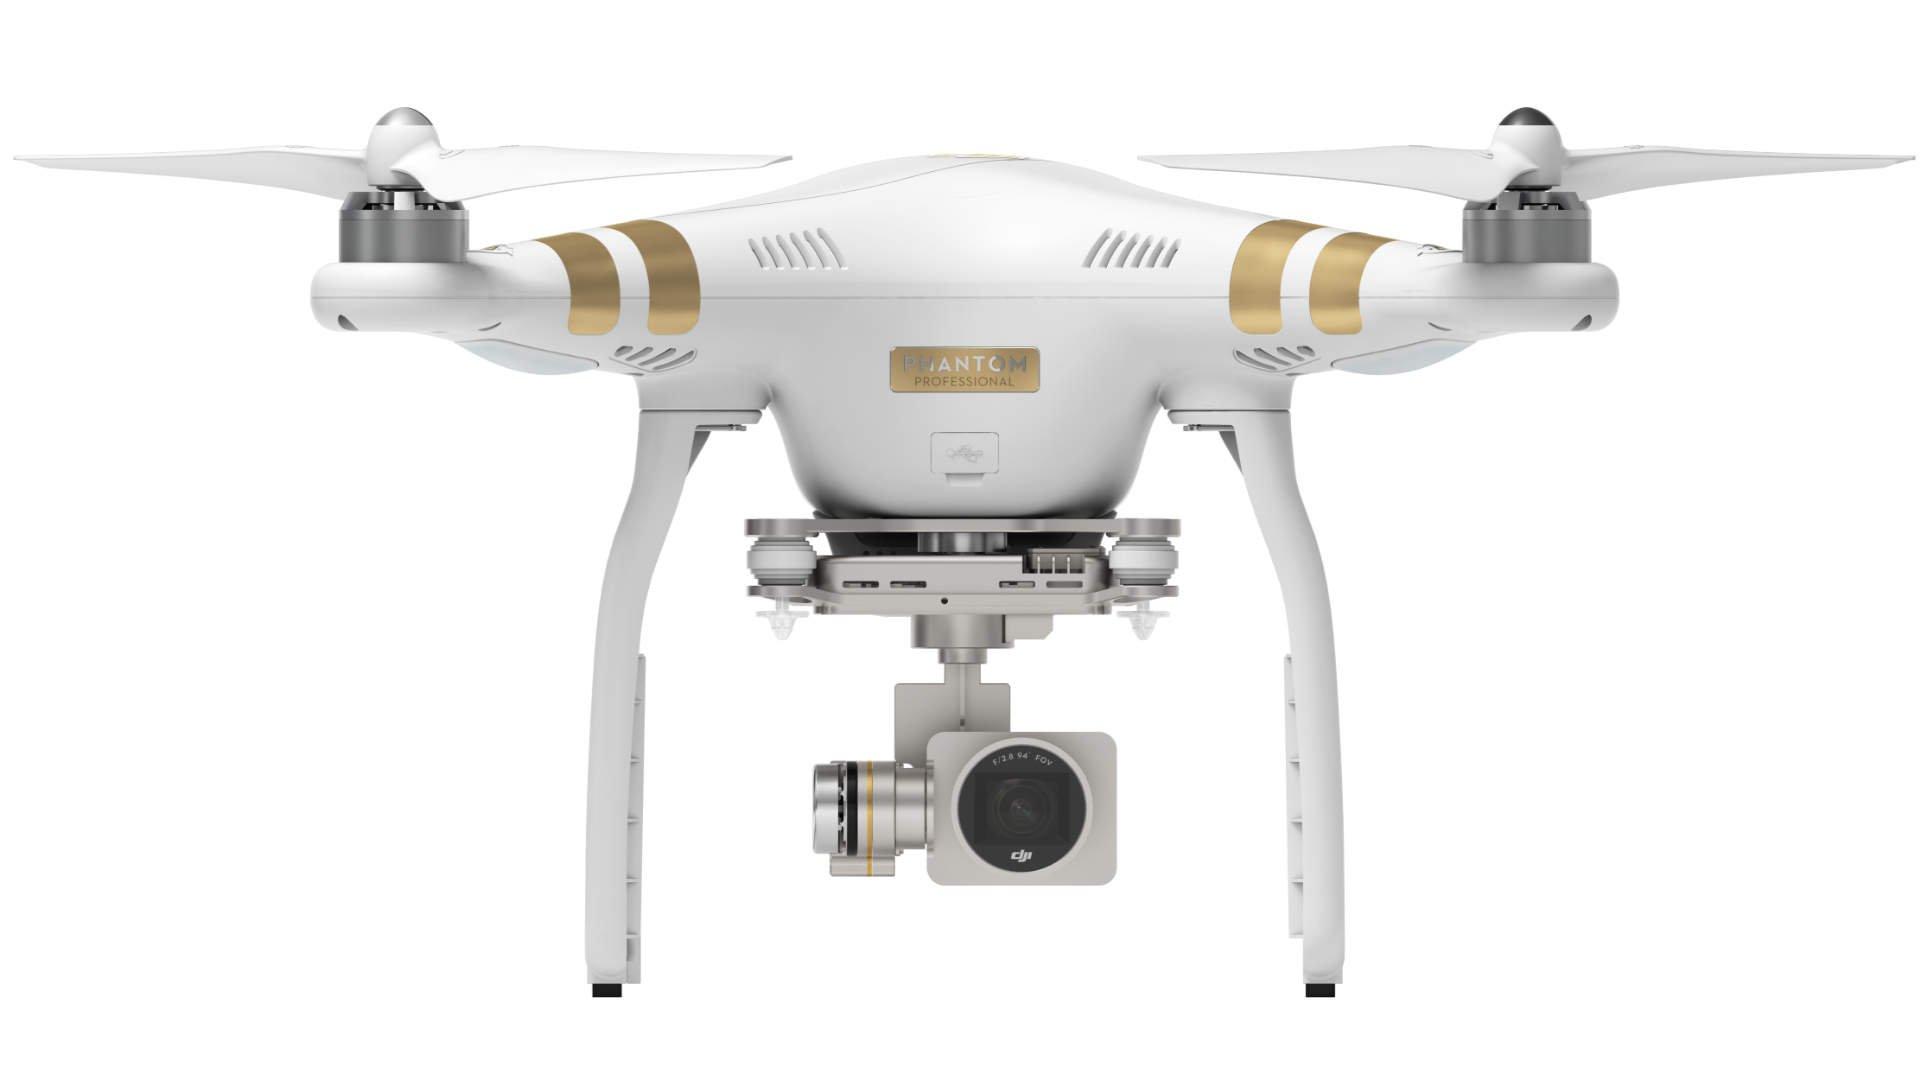 DJI Phantom 3 Professional Drohne